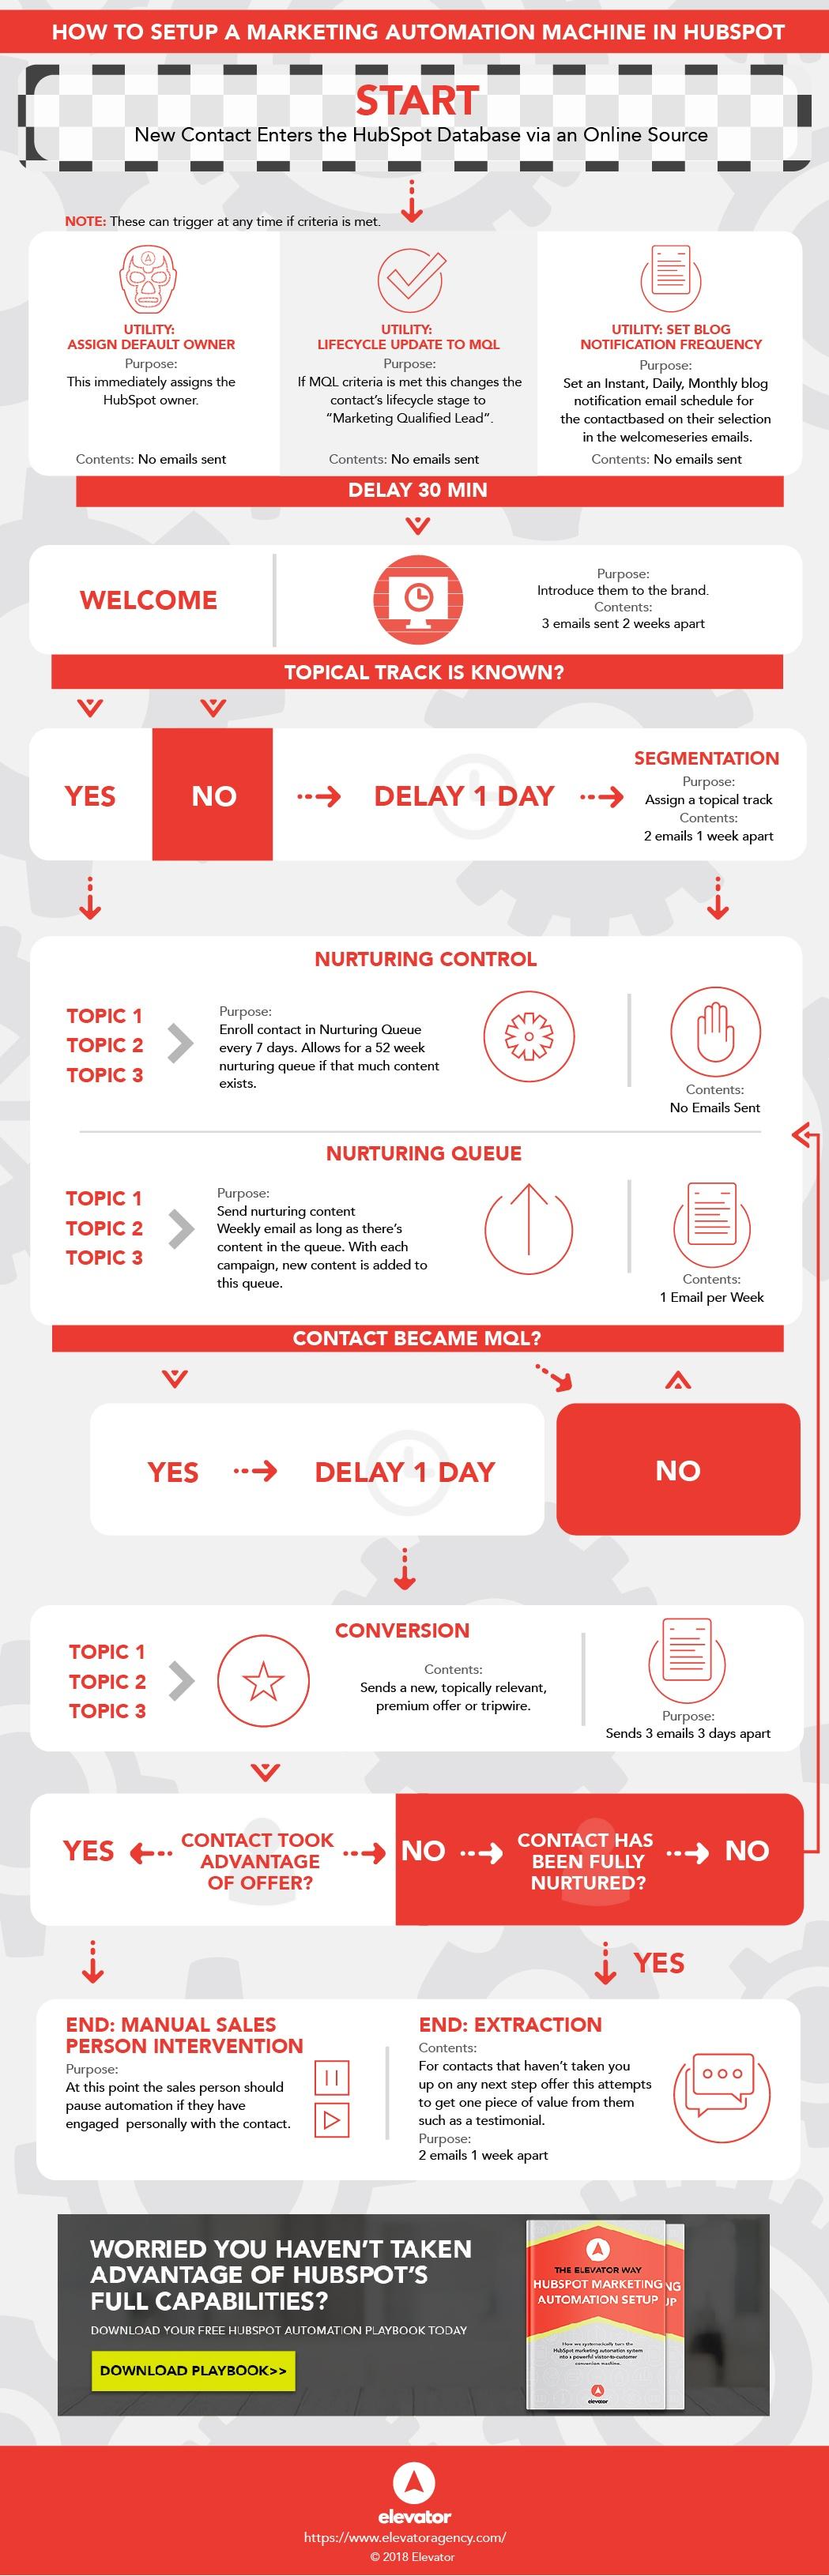 hubspot-machine-setup-infographic